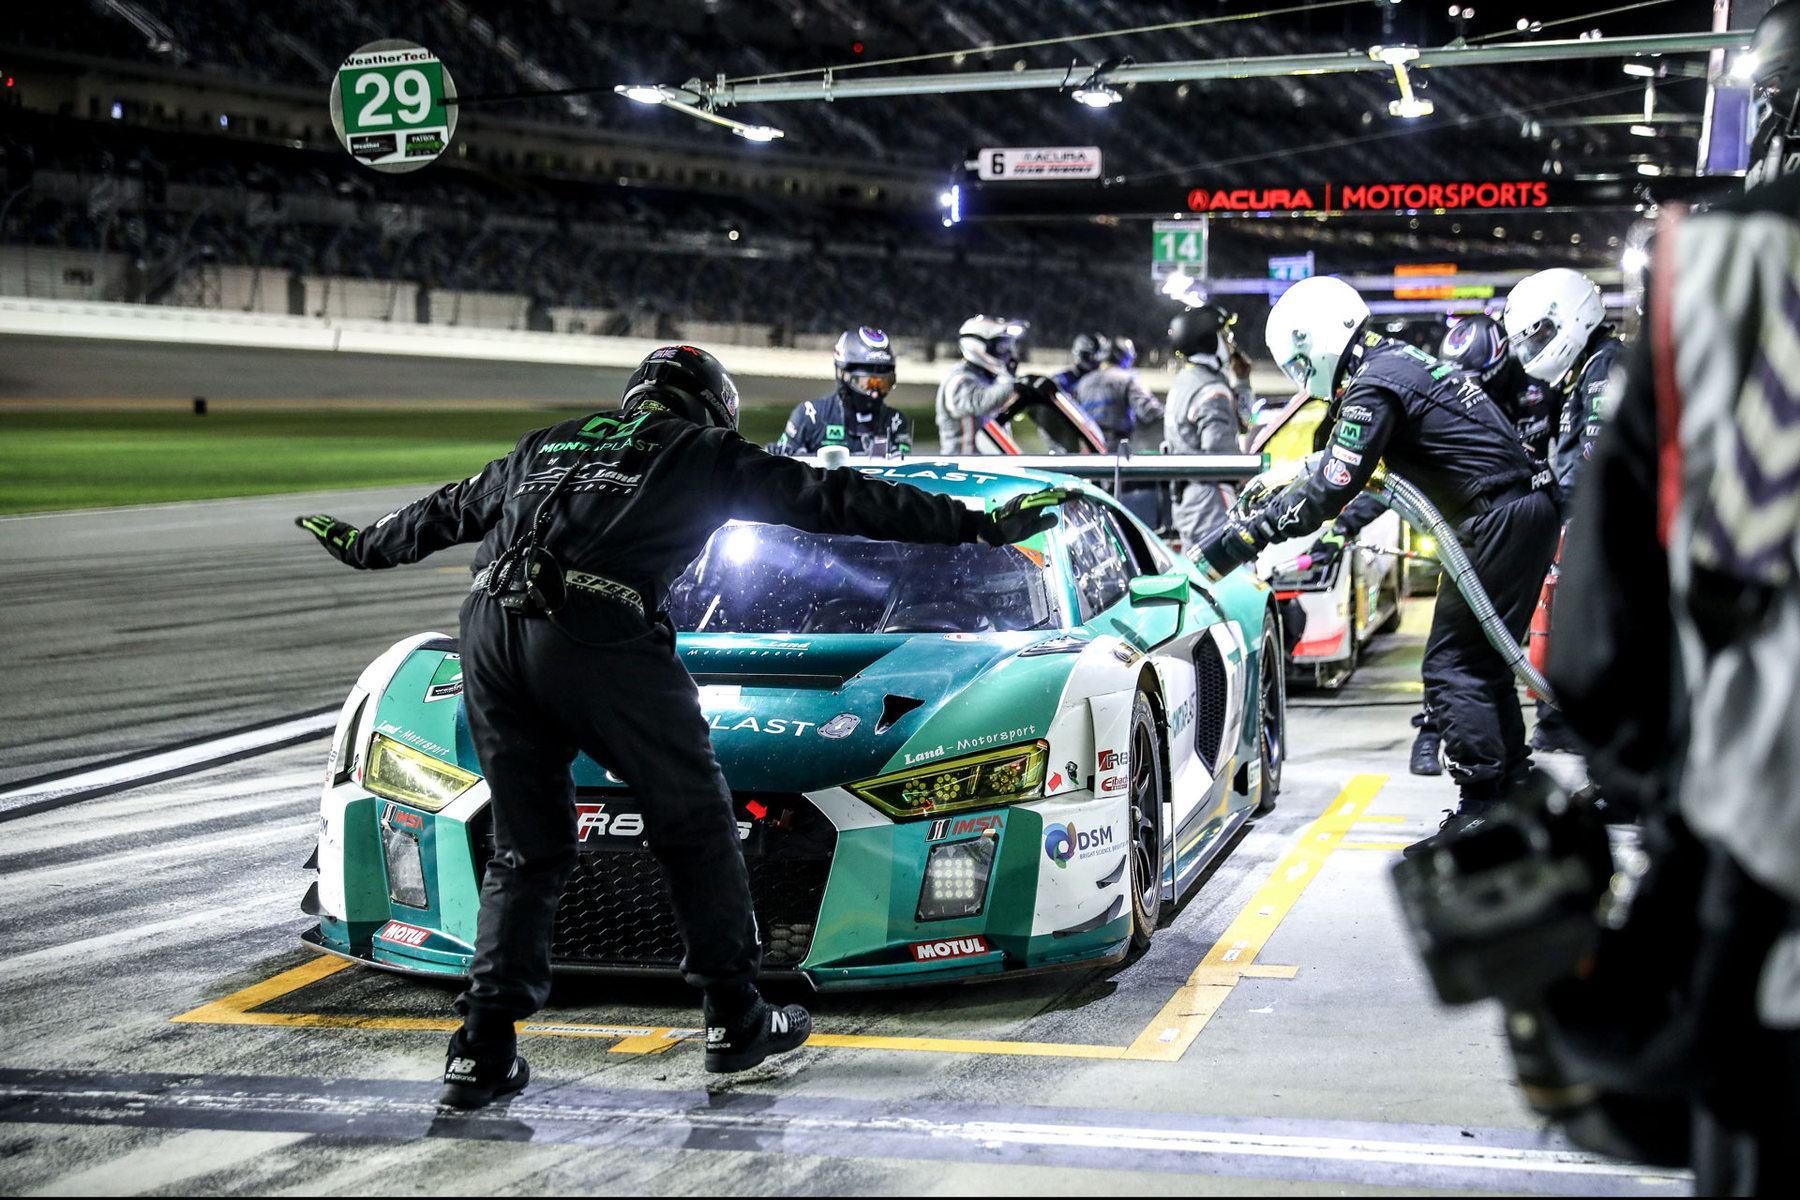 24h Daytona 2018 - Foto: Gruppe C Photography; #29 Audi R8 LMS GT3, Montaplast by Land-Motorsport: Sheldon van der Linde, Kelvin van der Linde, Jeffrey Schmidt, Christopher Mies